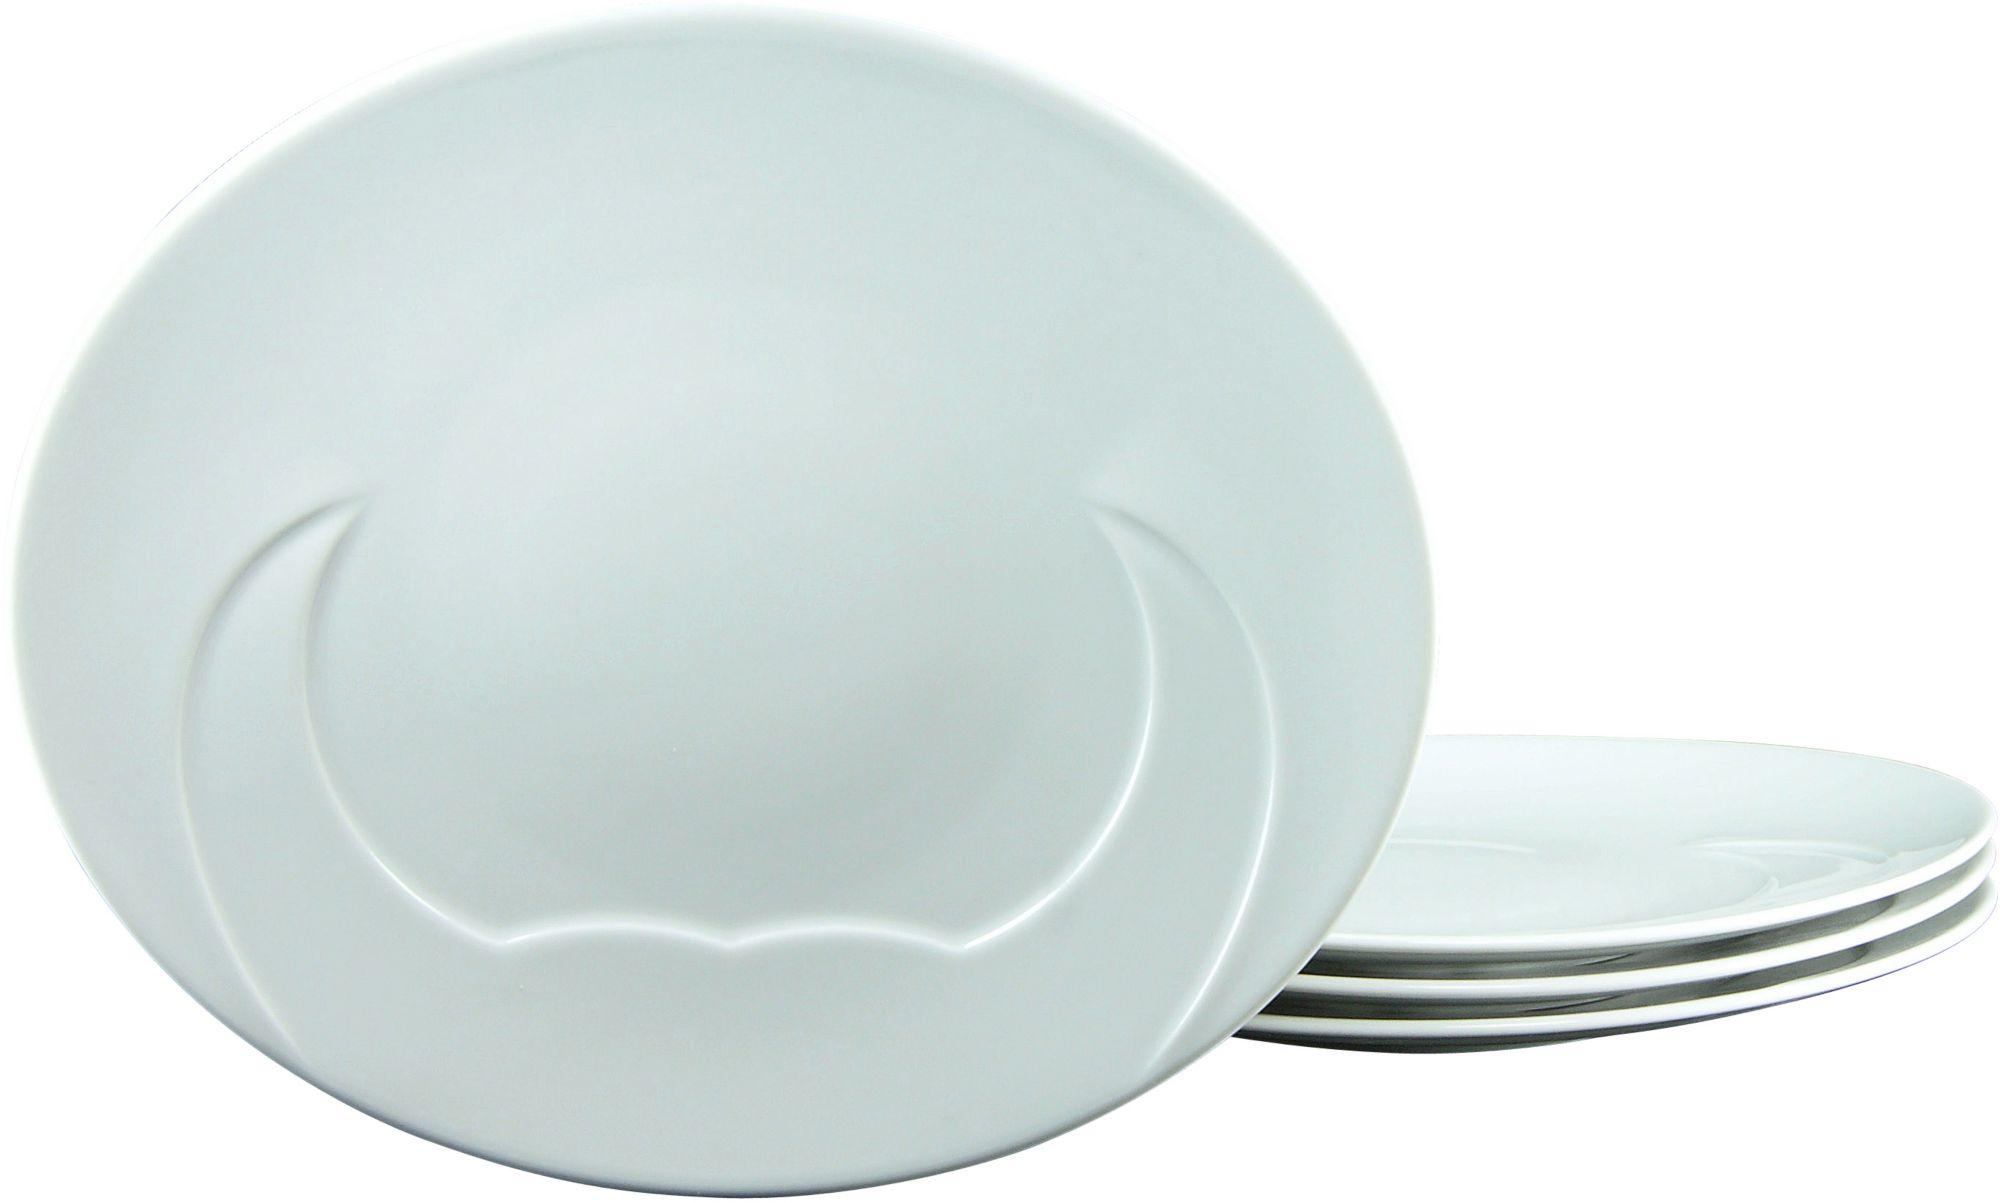 CREATABLE CreaTable Grillteller, Porzellan, 30 cm, »MEAT« (4 Stck.)